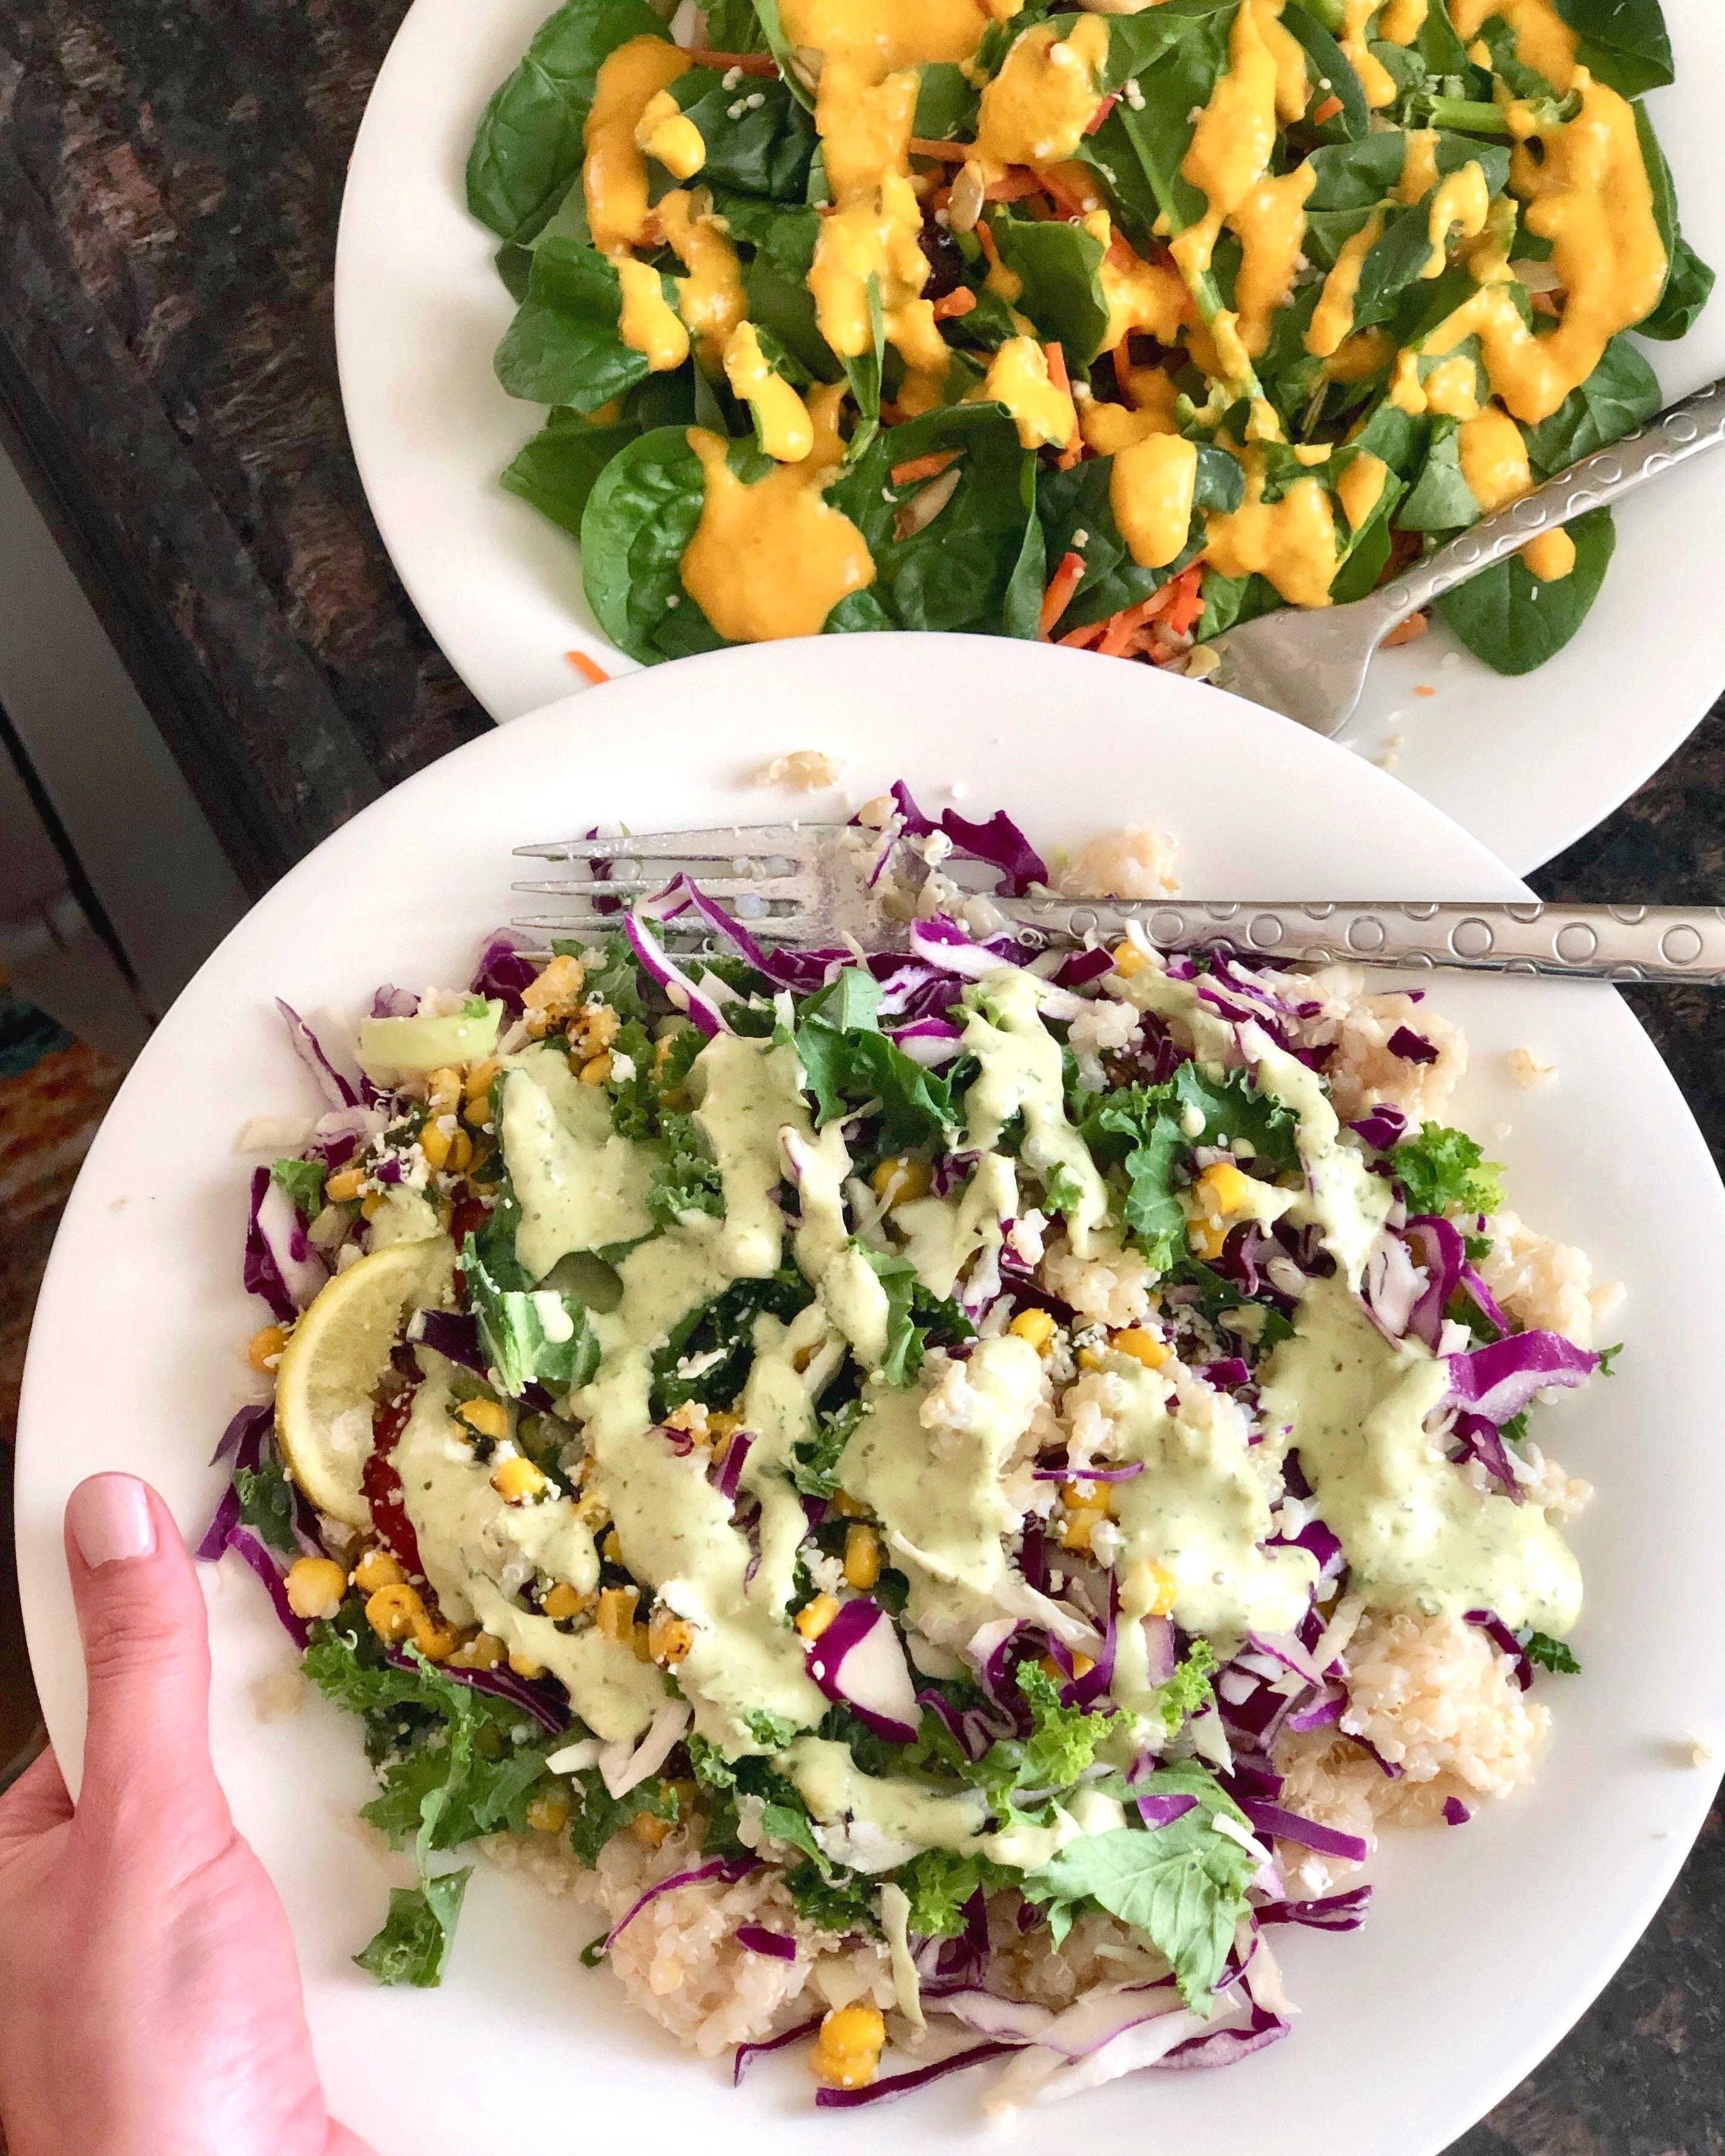 Trader Joes salads